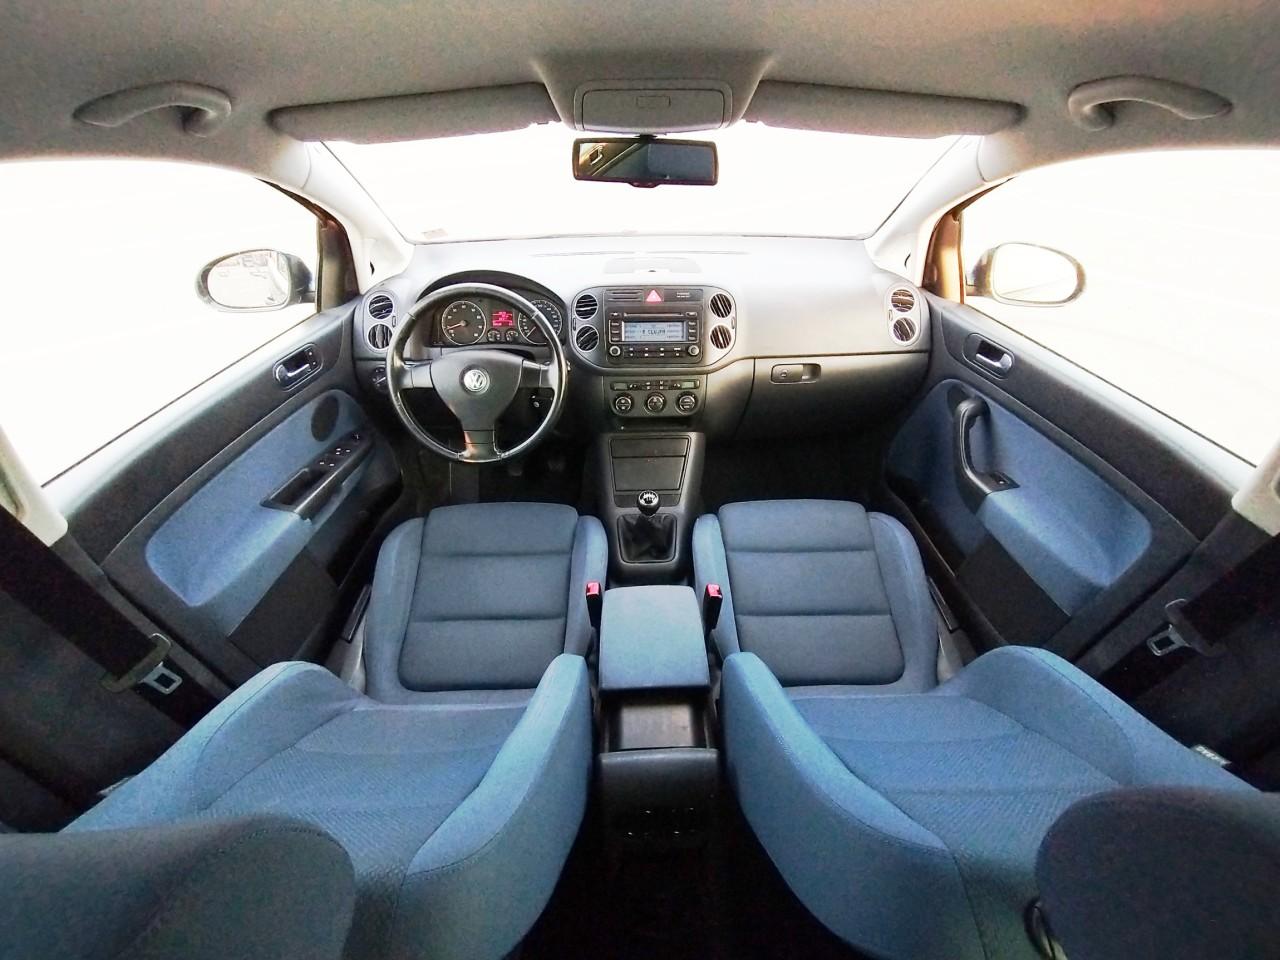 VW Golf Plus Highline Sport Edition 1.6 FSI 131 CP Klimatronic, Jante, Parking 2005